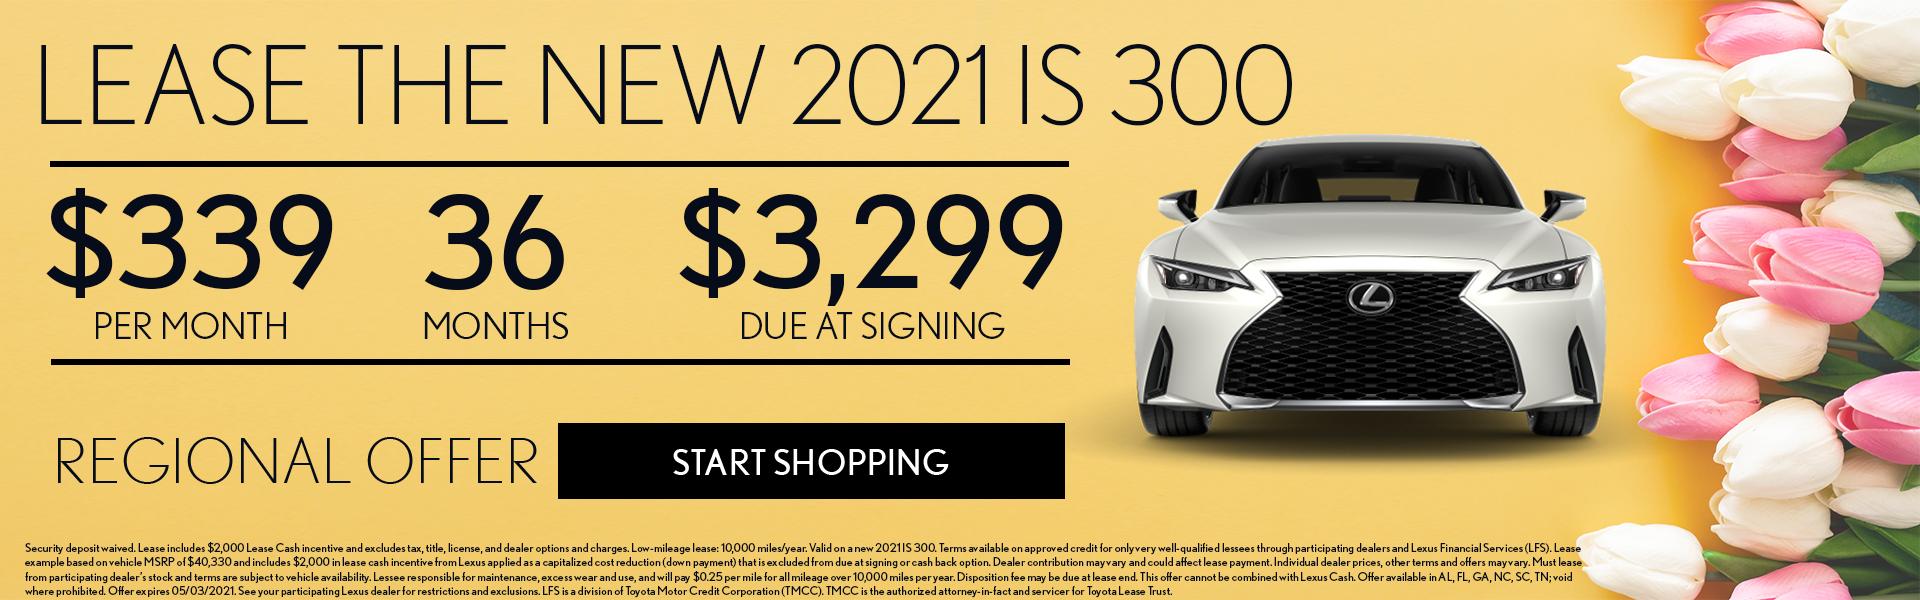 2021 IS 300 $339